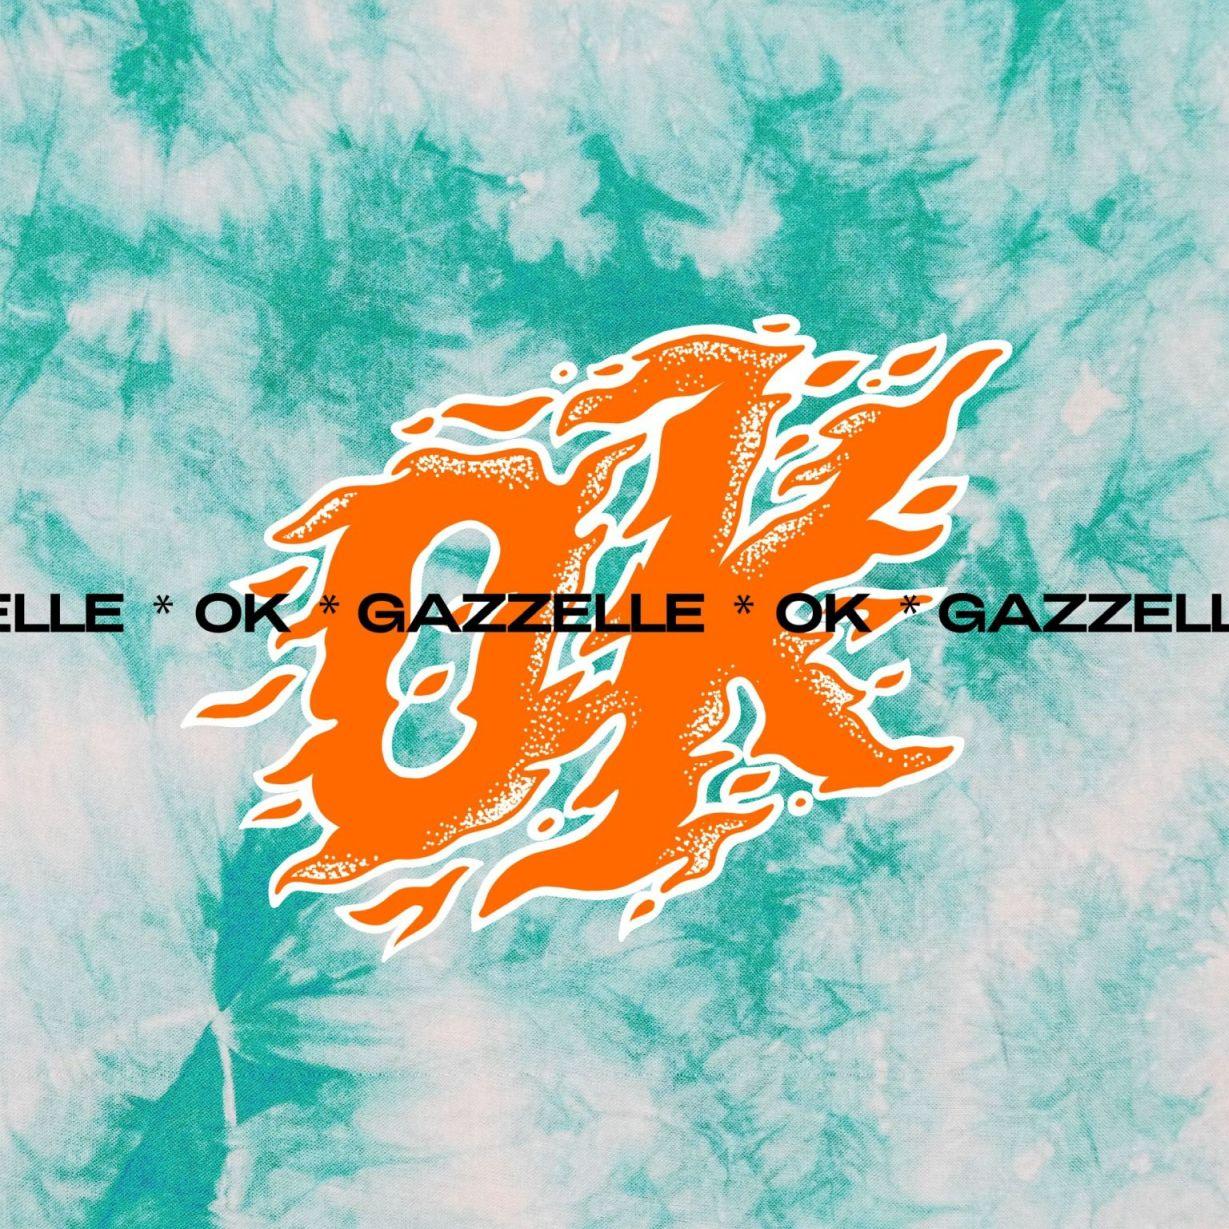 Gazzelle nuovo album